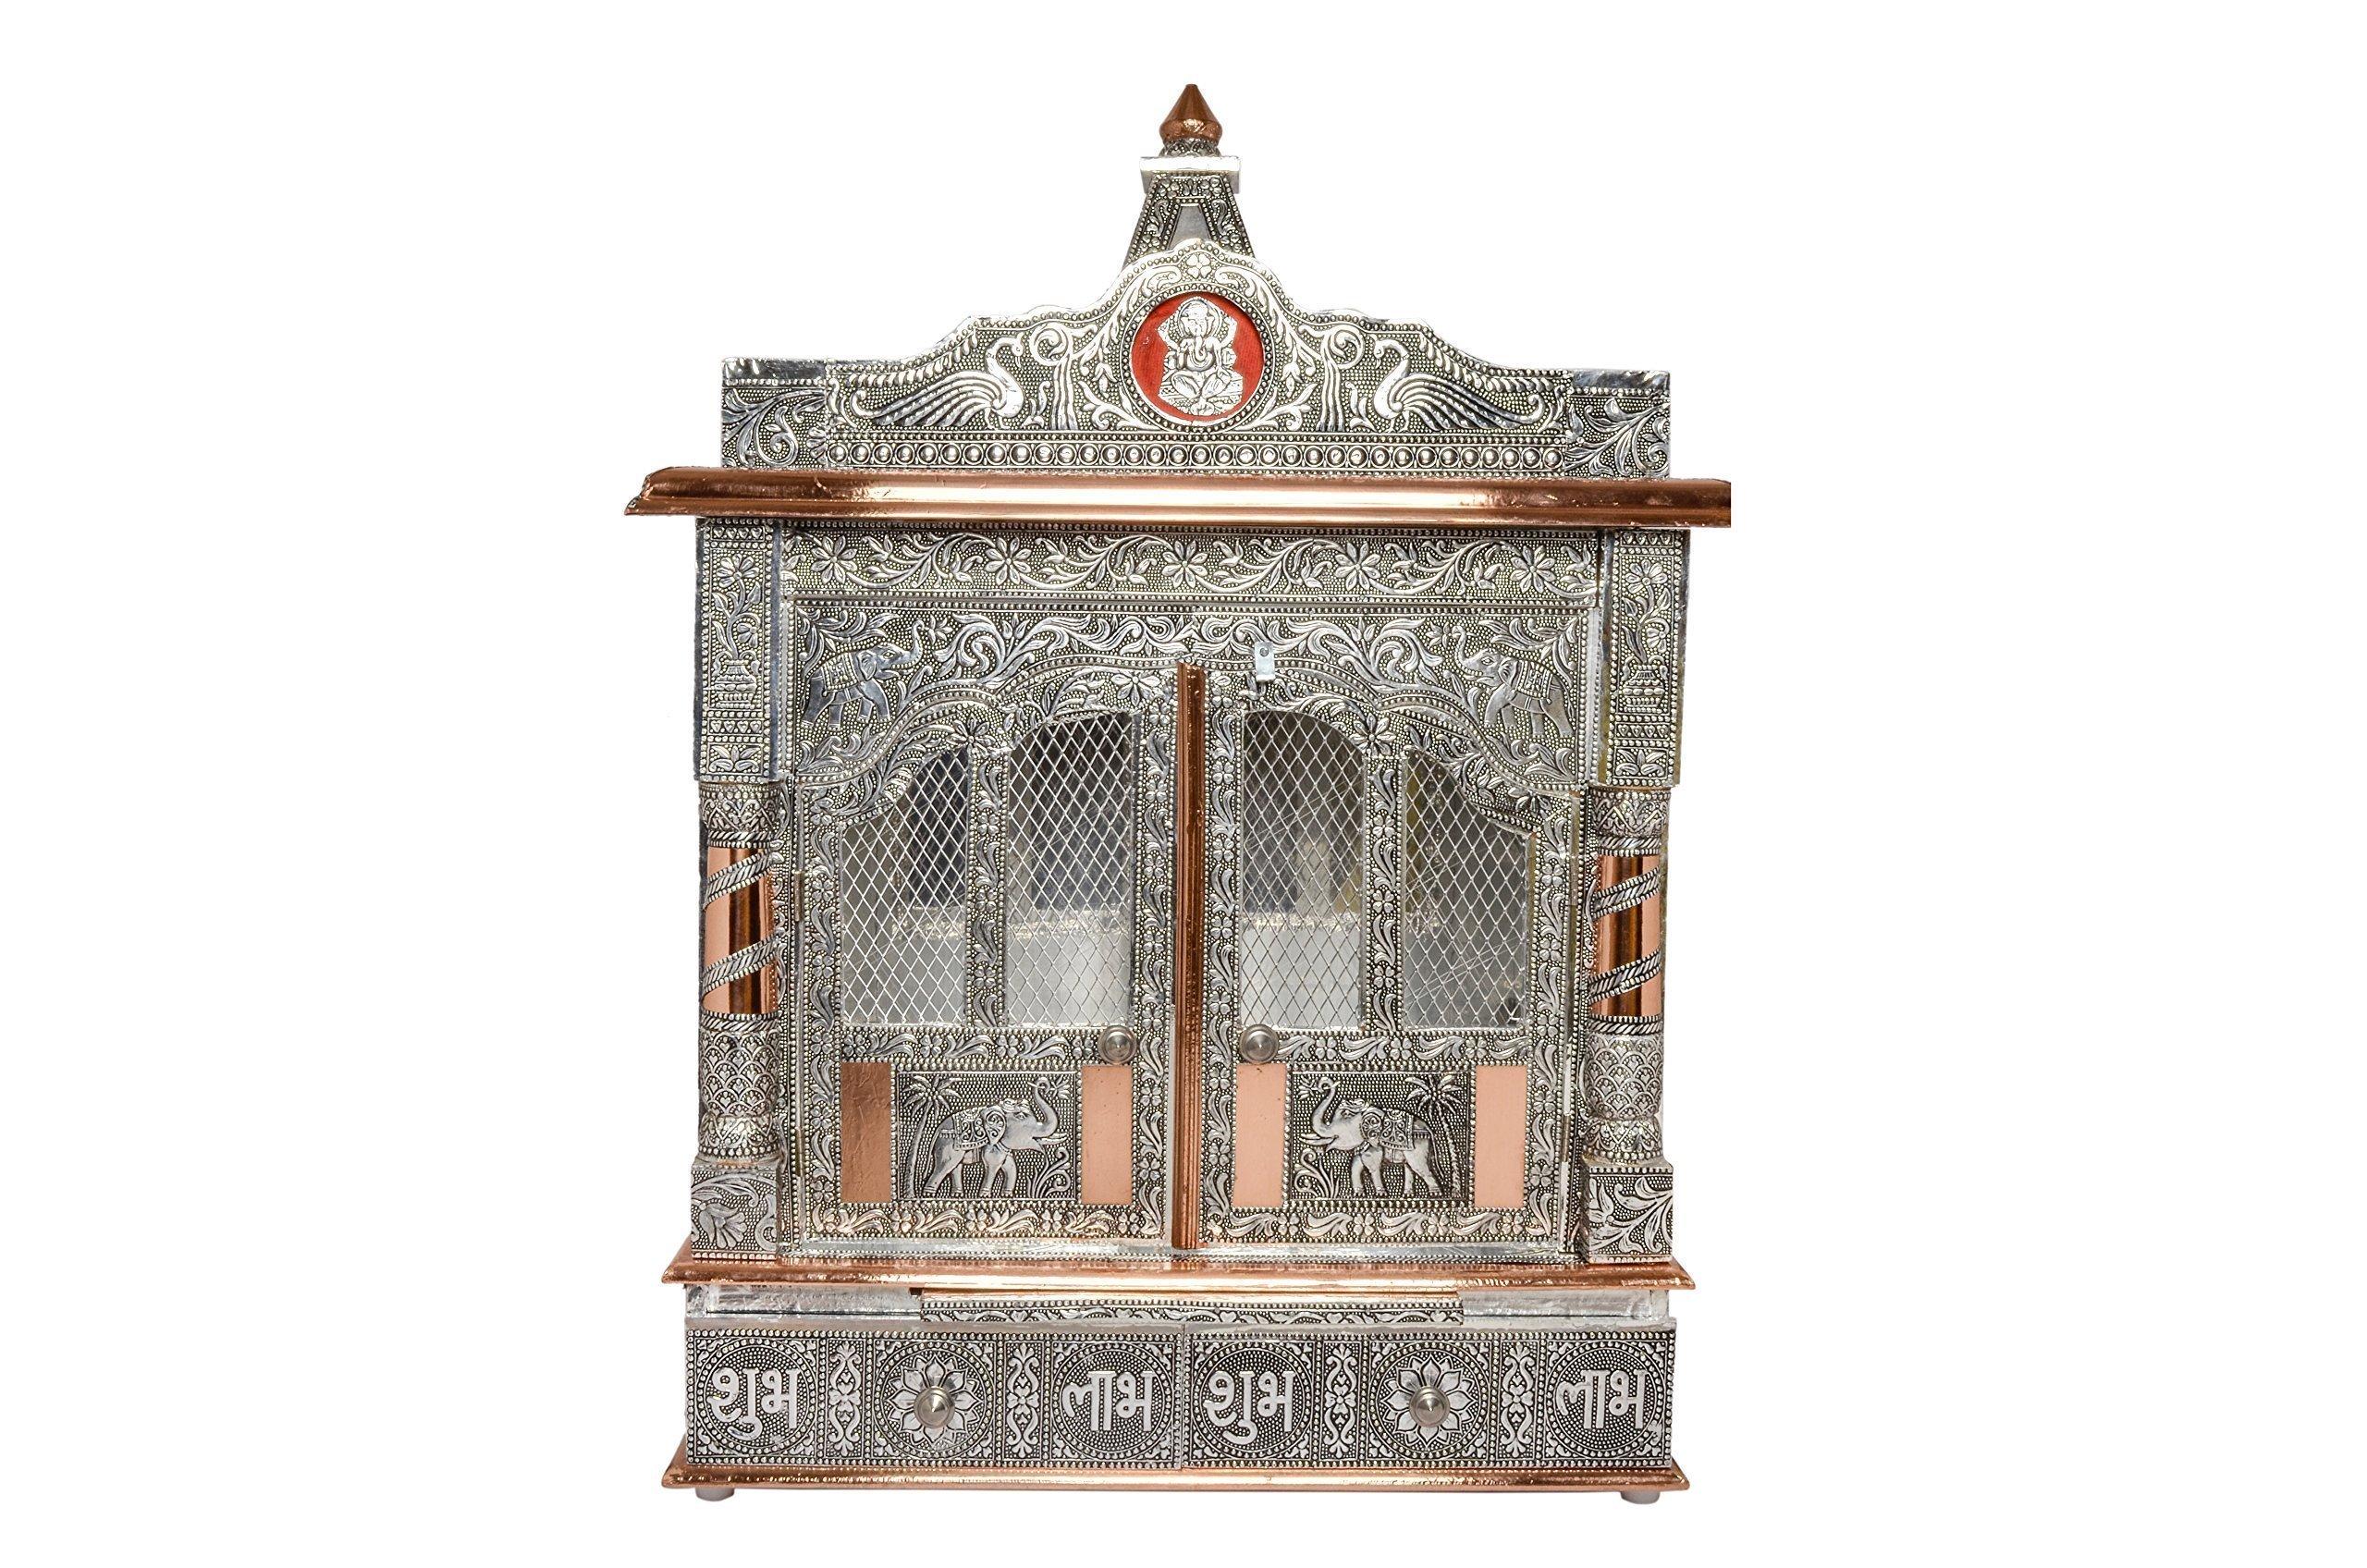 Movie Time Vdieo 59067-DL Hindu Puja Mandir/Temple/Alter, Aluminum Plated with Doors